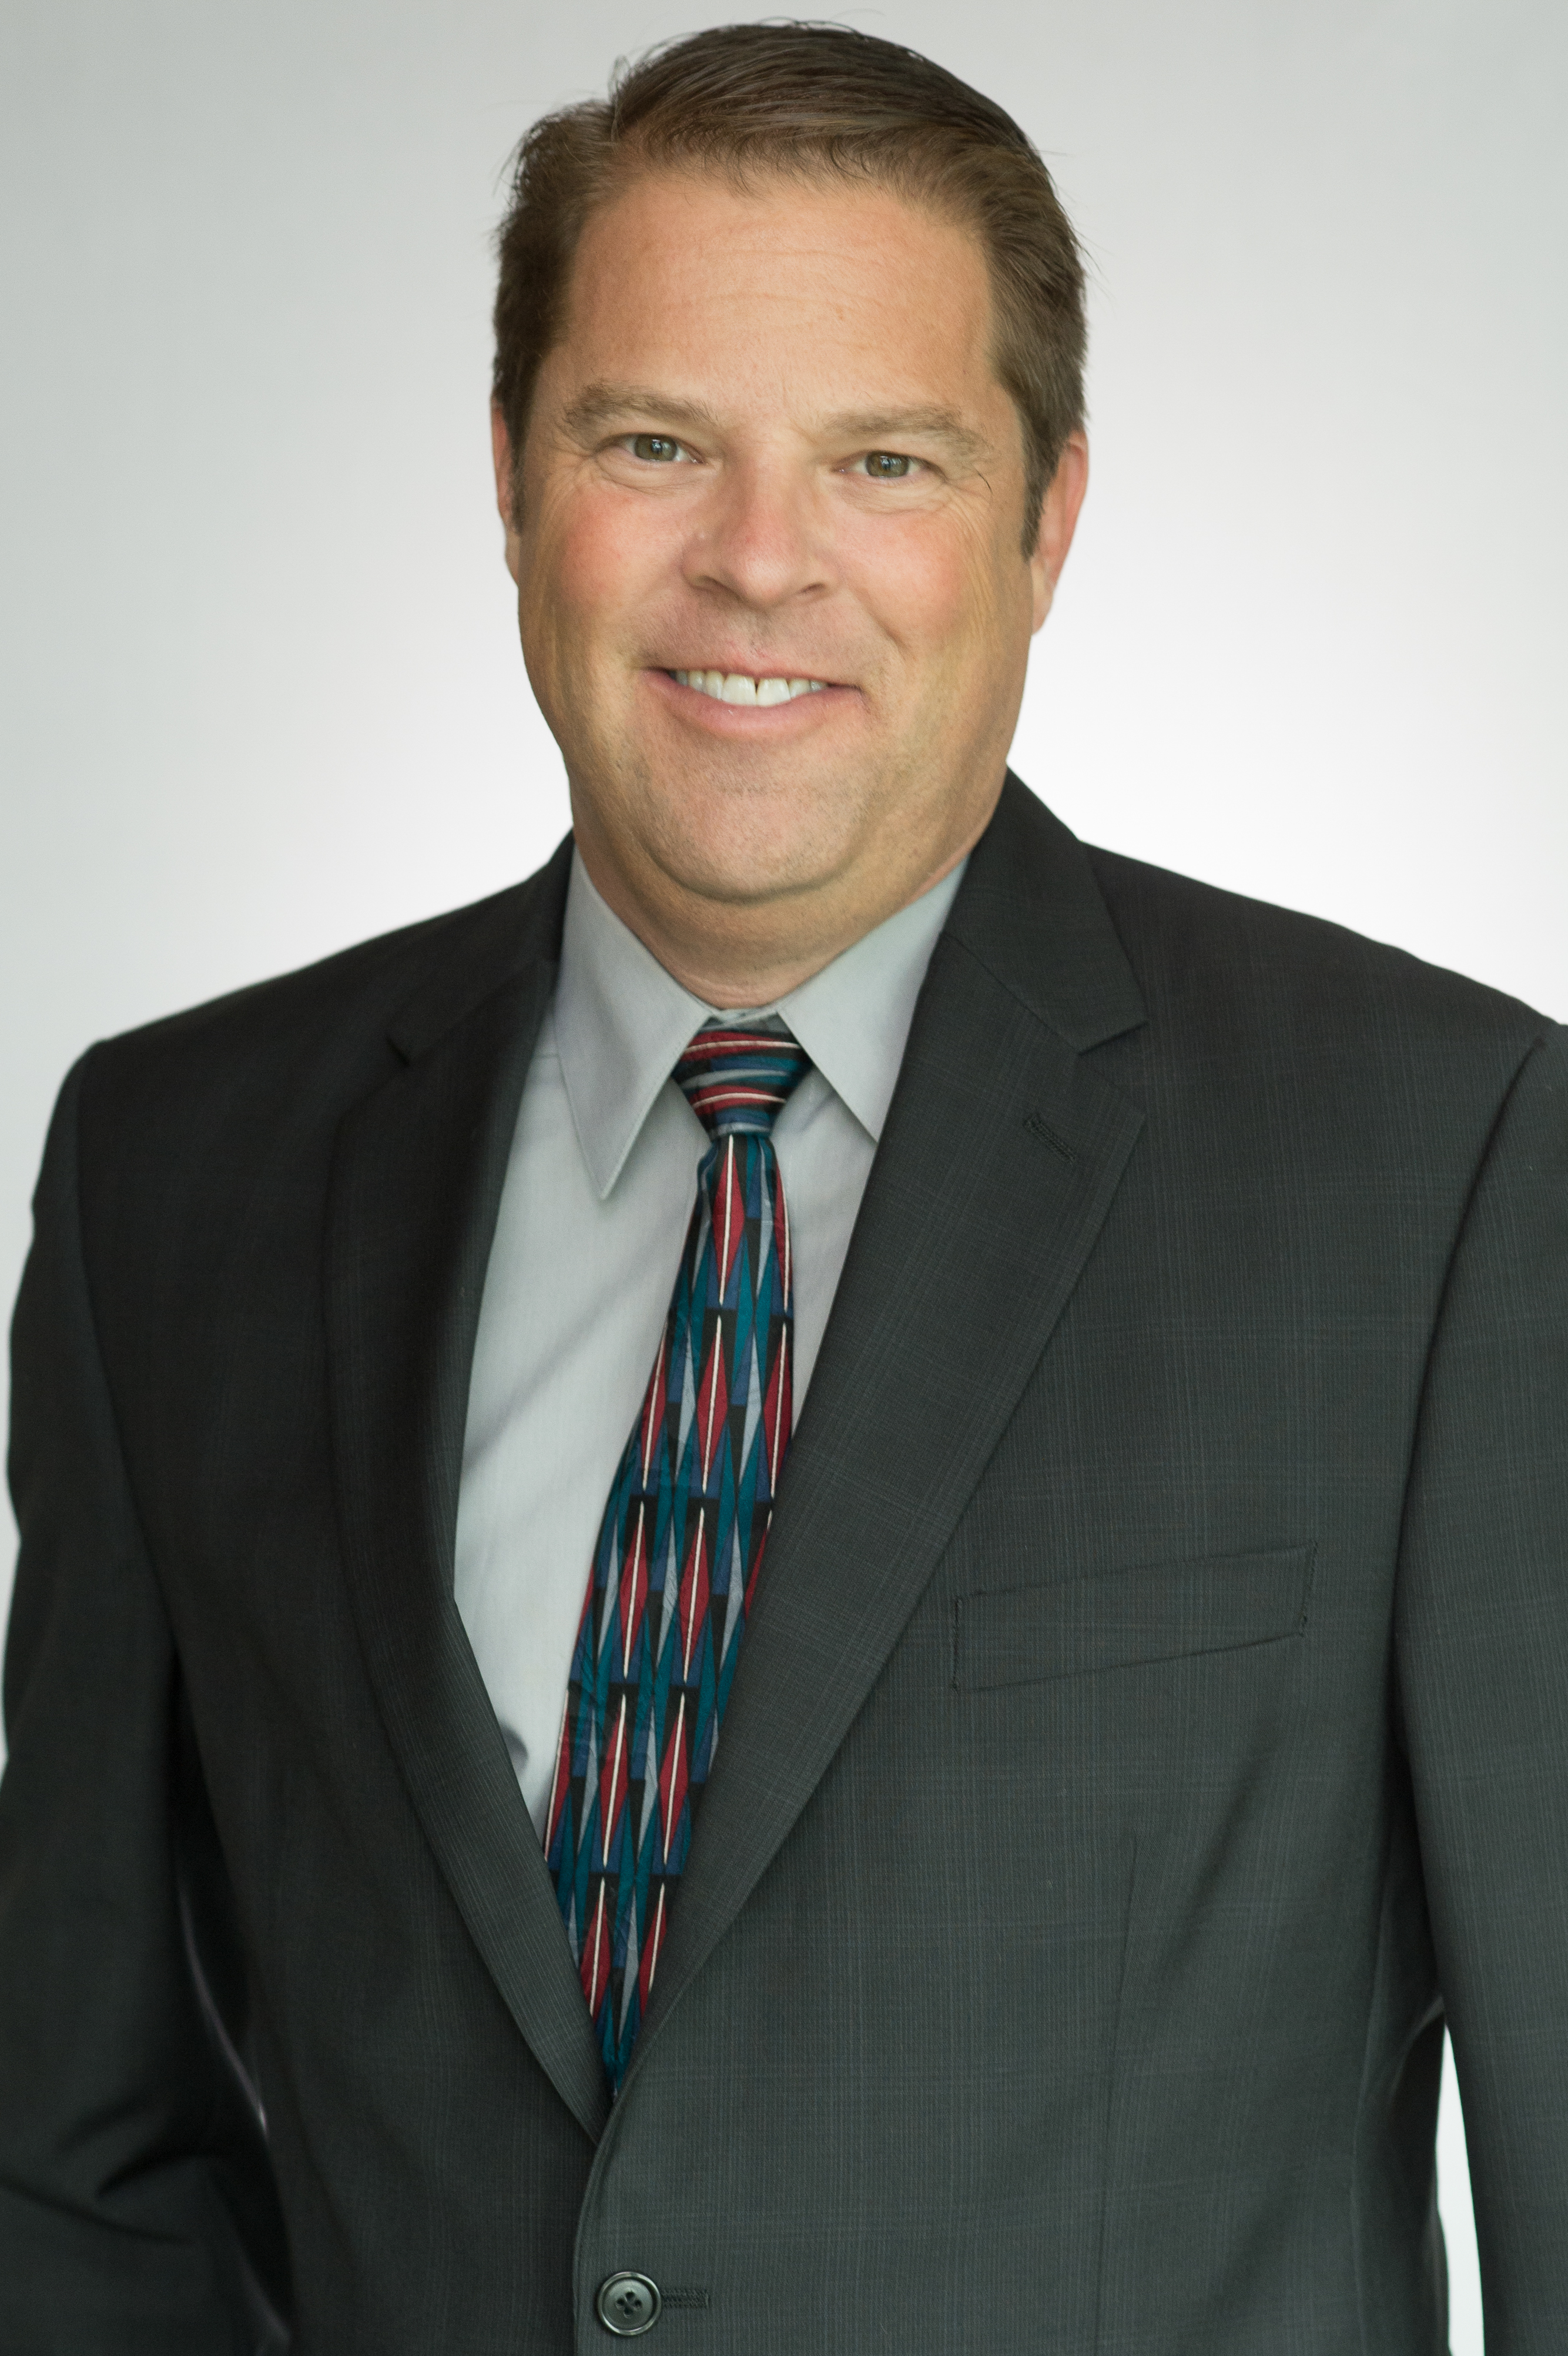 Scott Seal